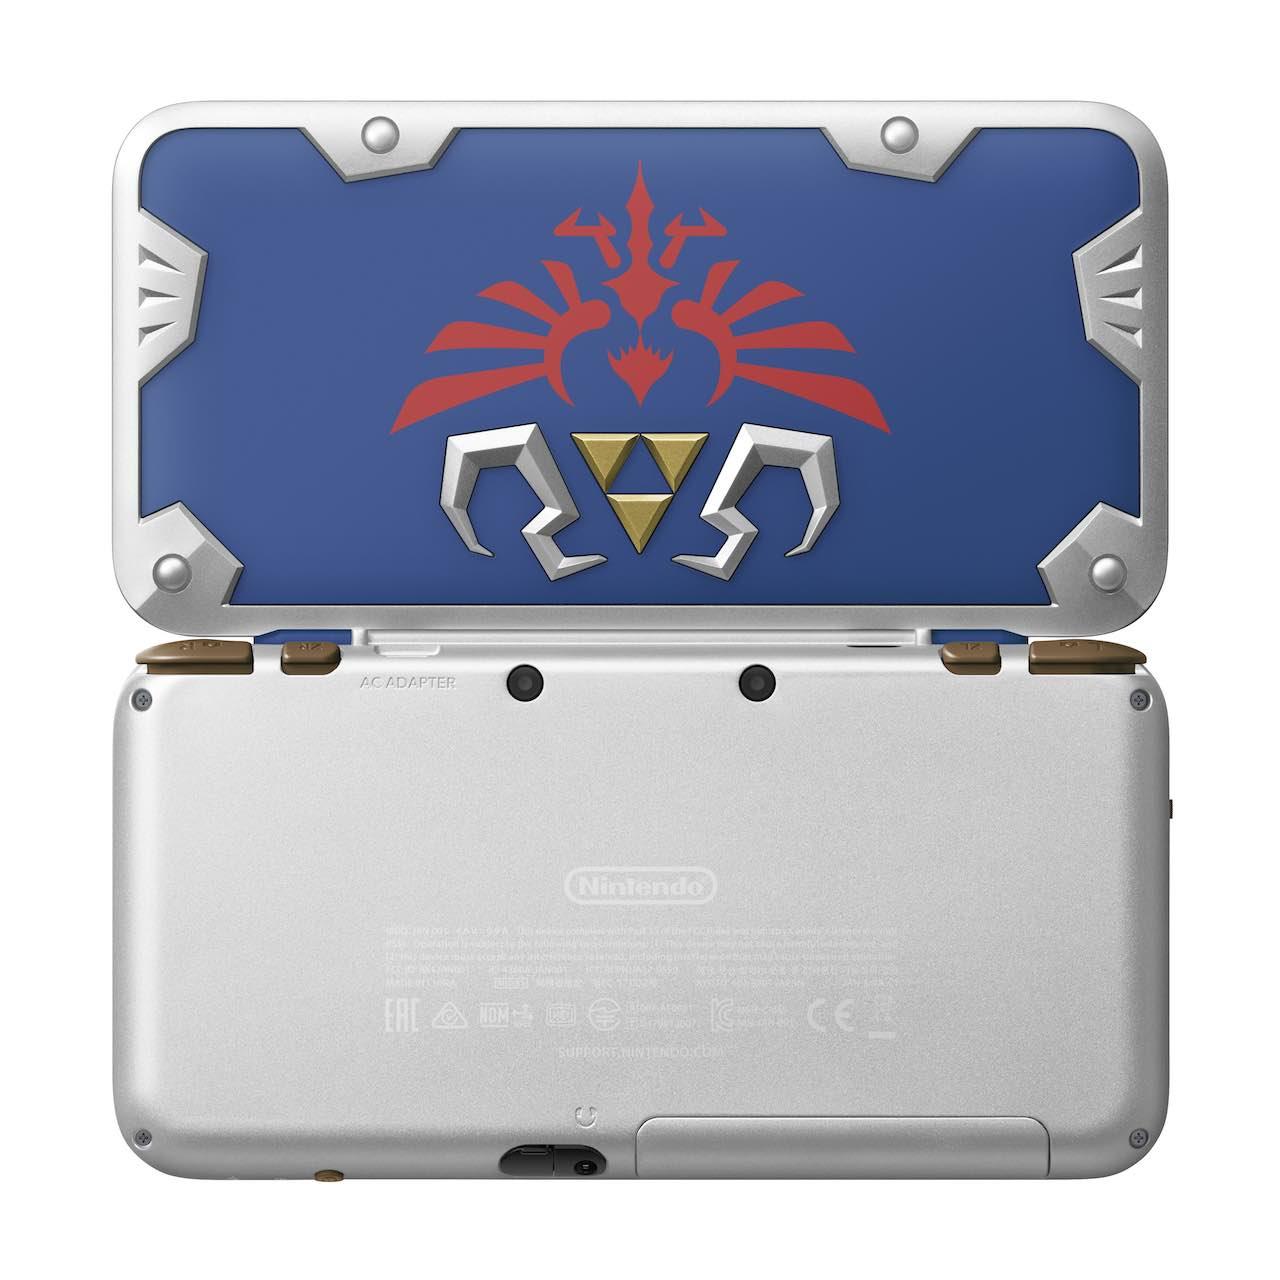 New Nintendo 2DS XL Hylian Shield Edition Photo 2